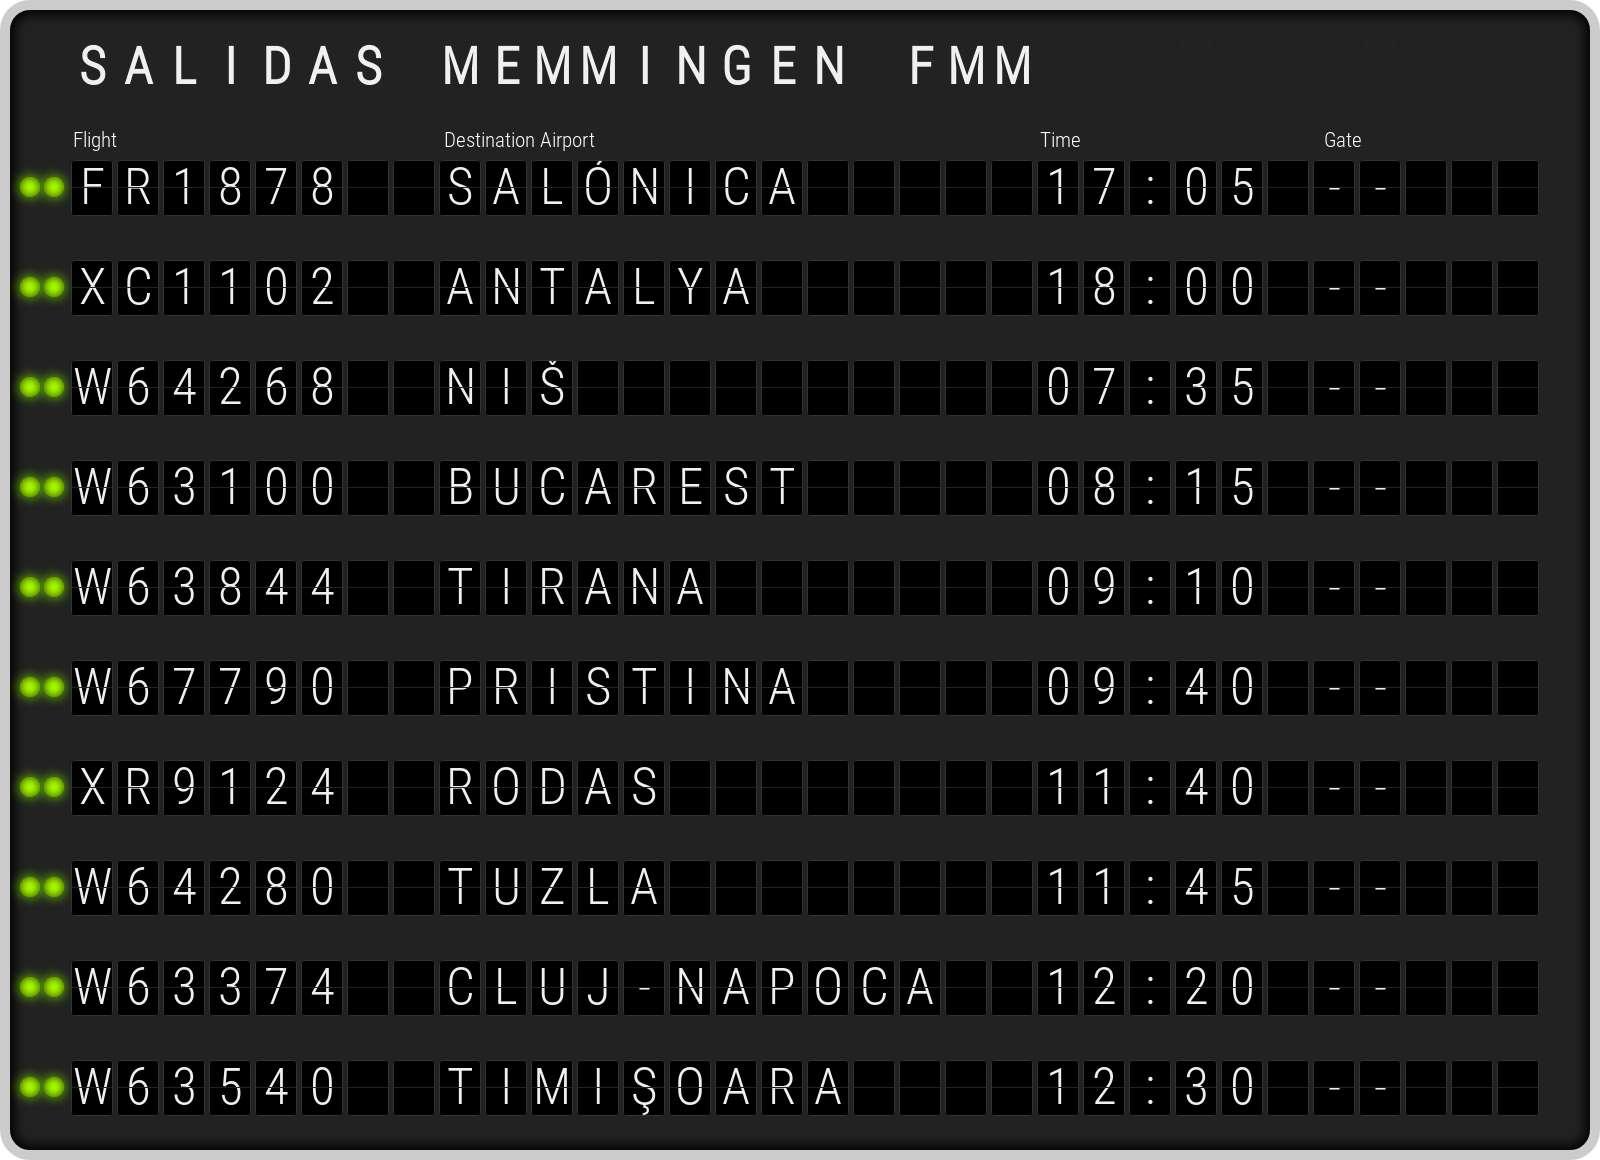 Memmingen Salidas FMM.  Horarios de salida al Aeropuerto Memmingen